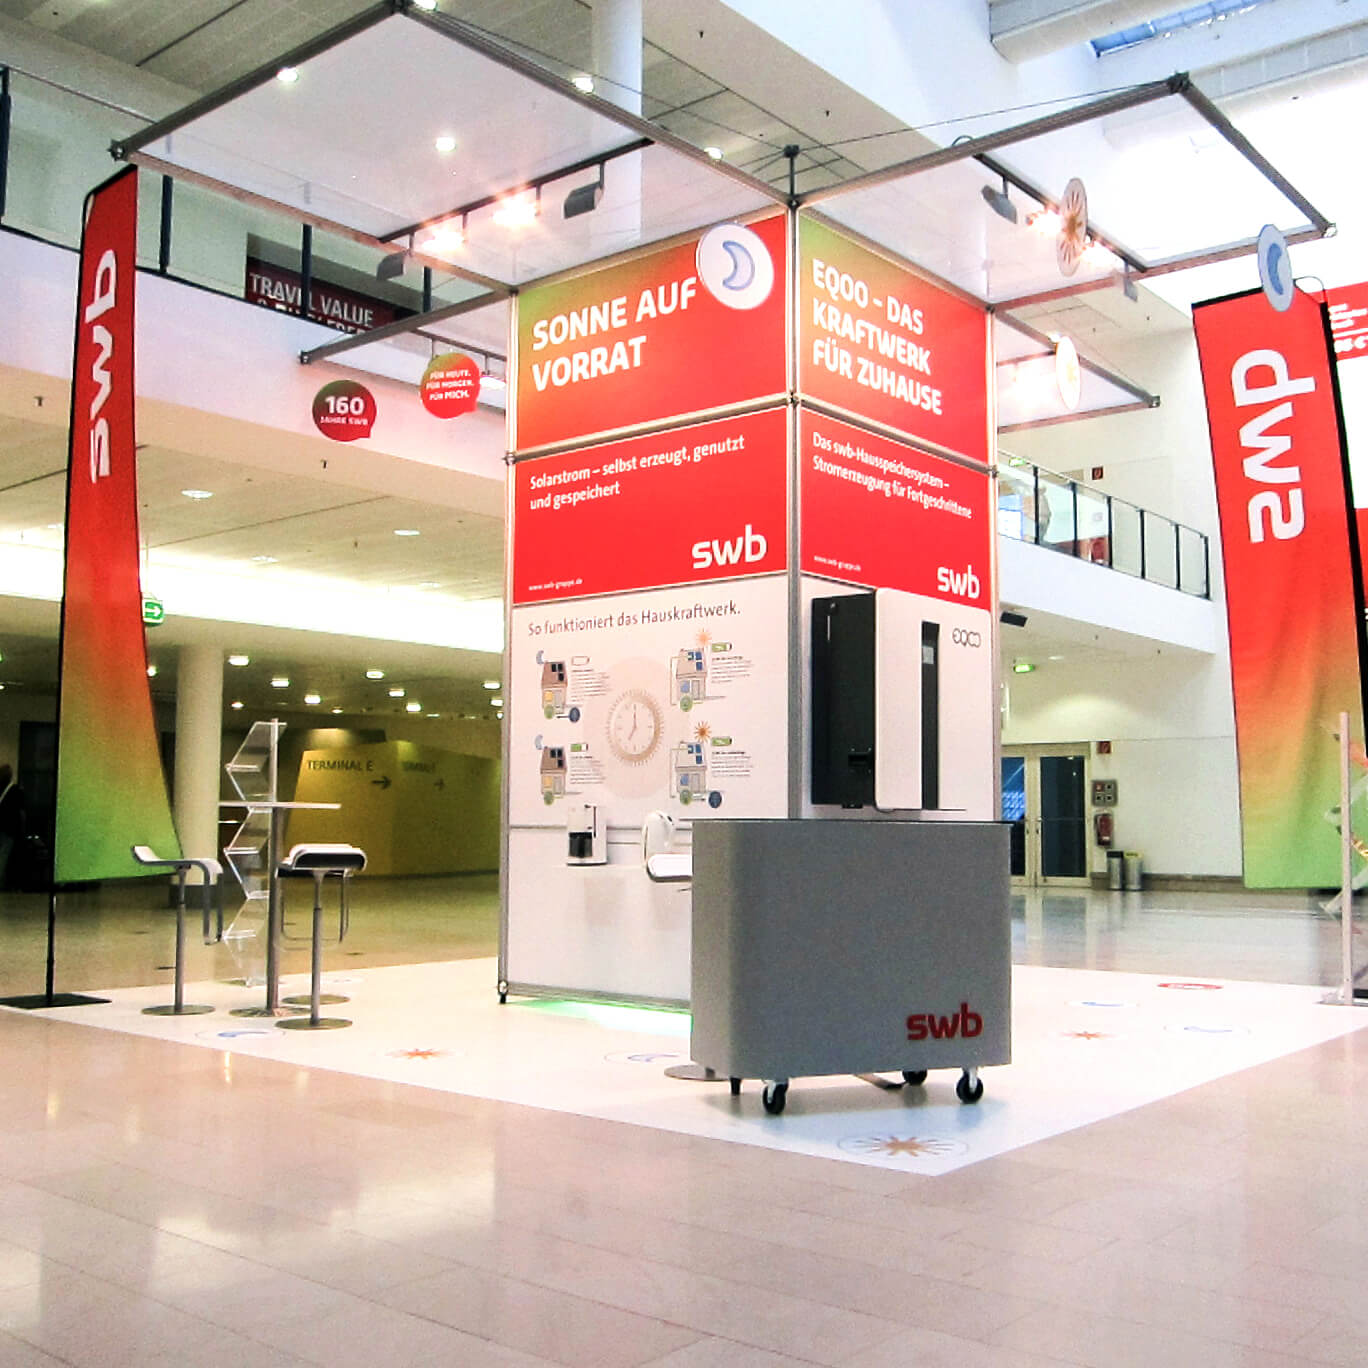 Anka Werbung - Messebau Bremen - Messebau (swb Tag der Technik)